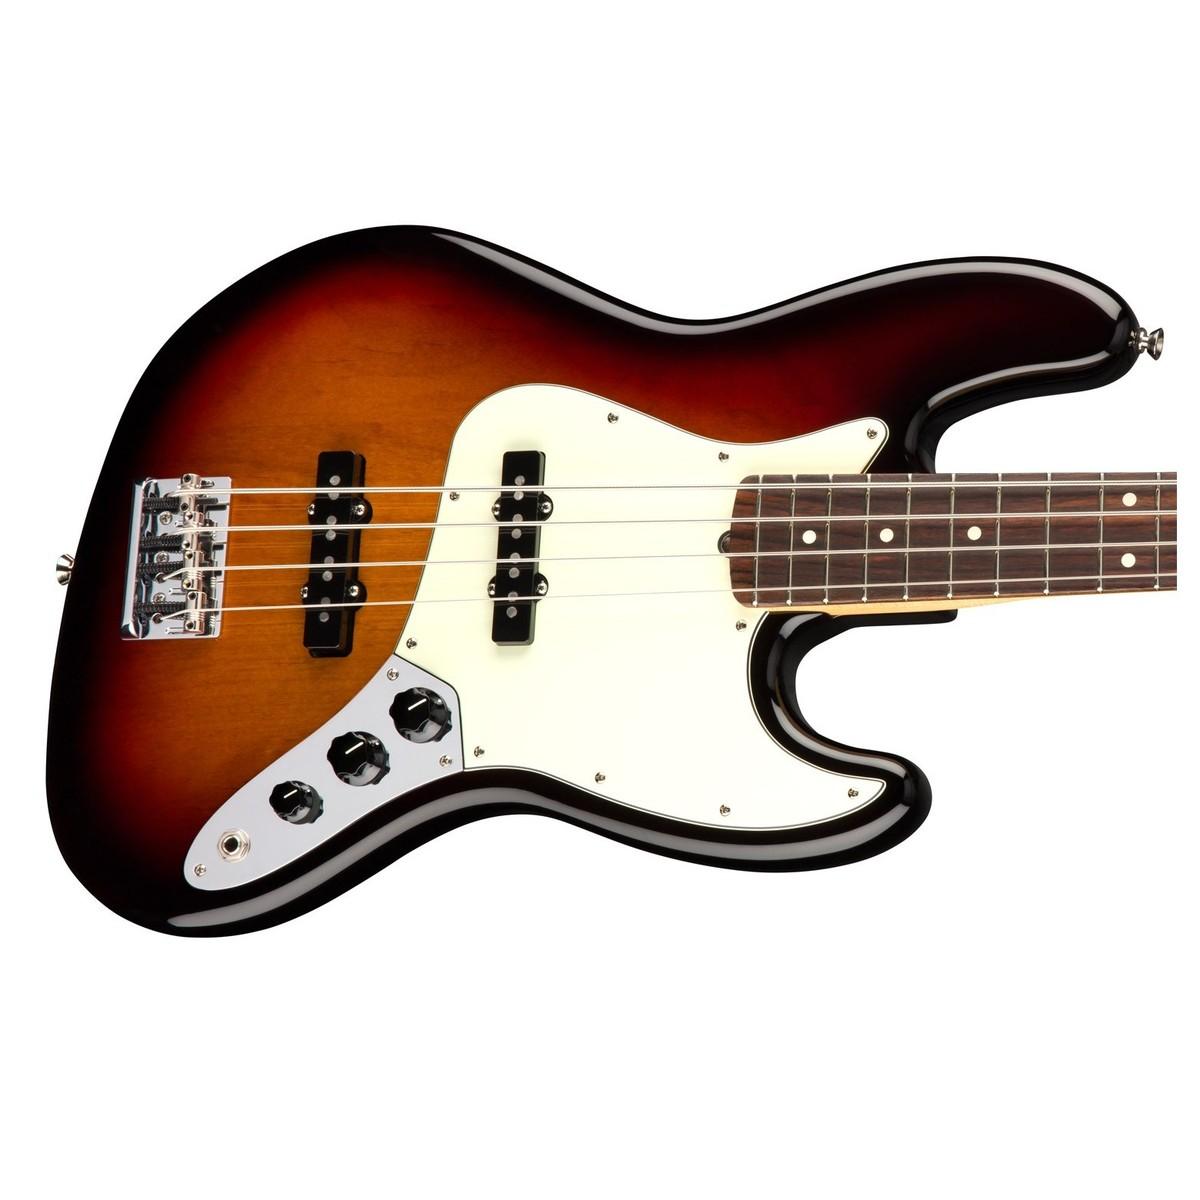 fender american professional jazz bass rw 3 tone sunburst at gear4music. Black Bedroom Furniture Sets. Home Design Ideas